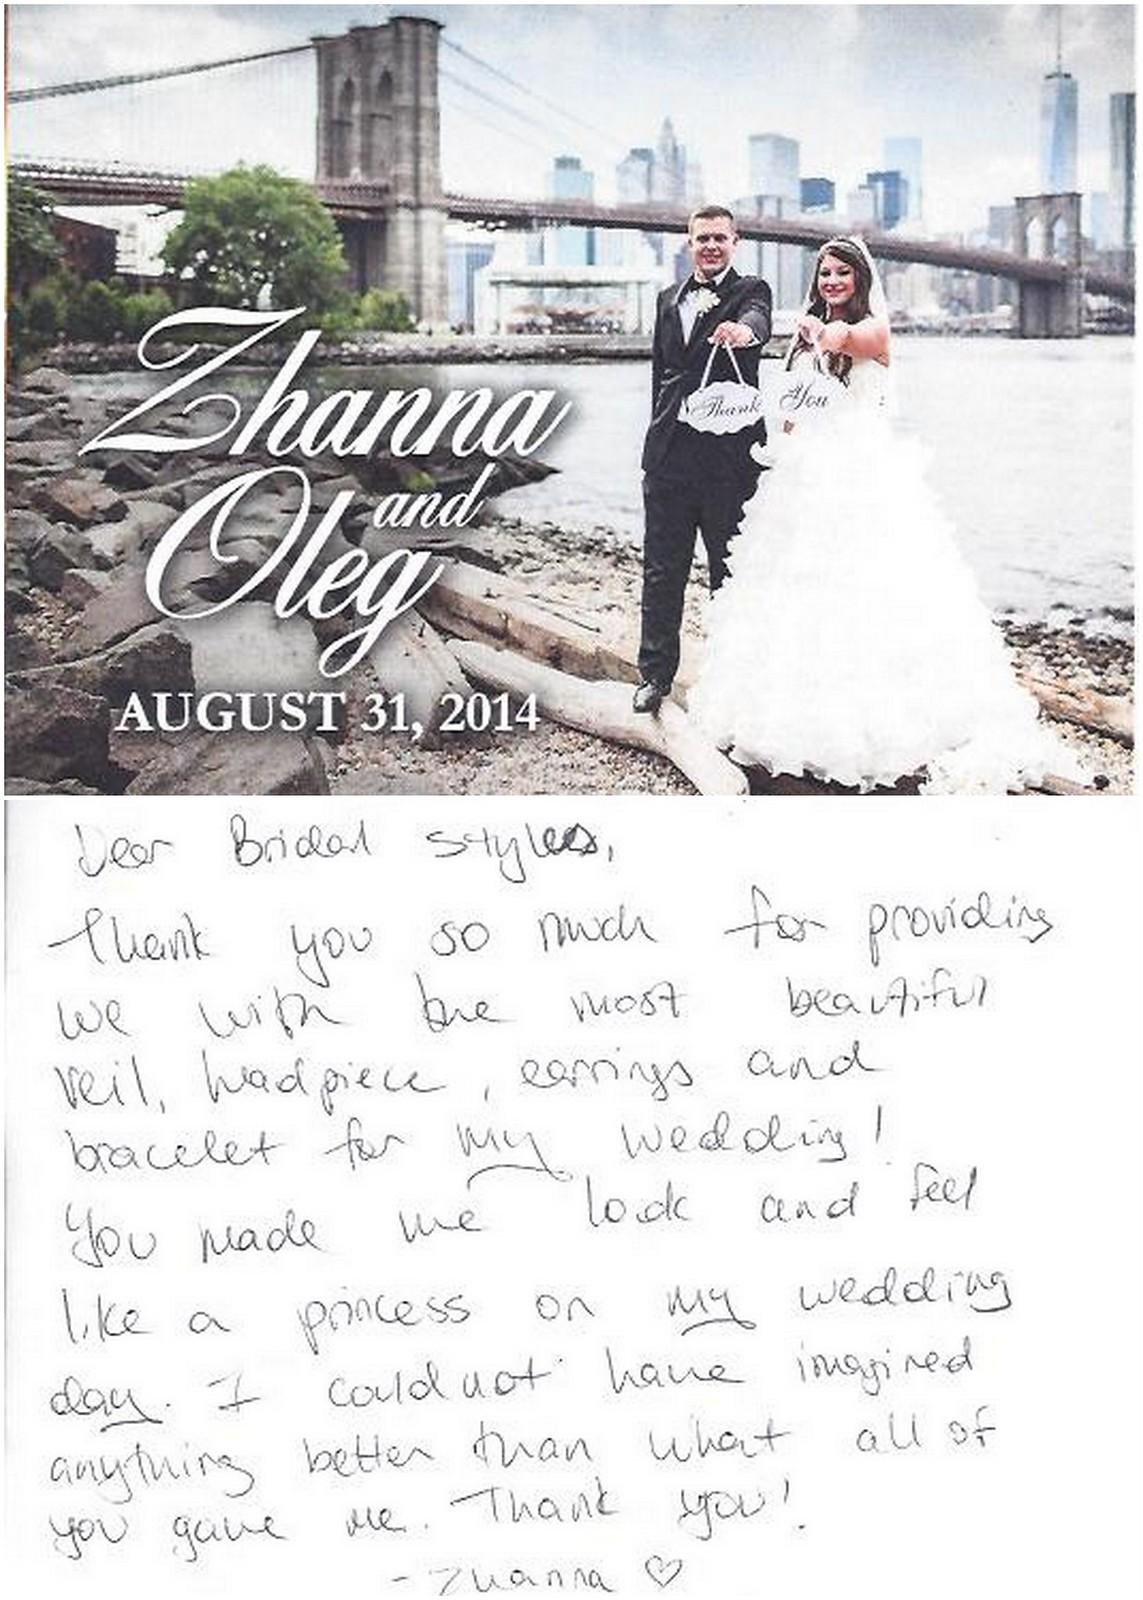 Bridal Styles Bride Zhanna